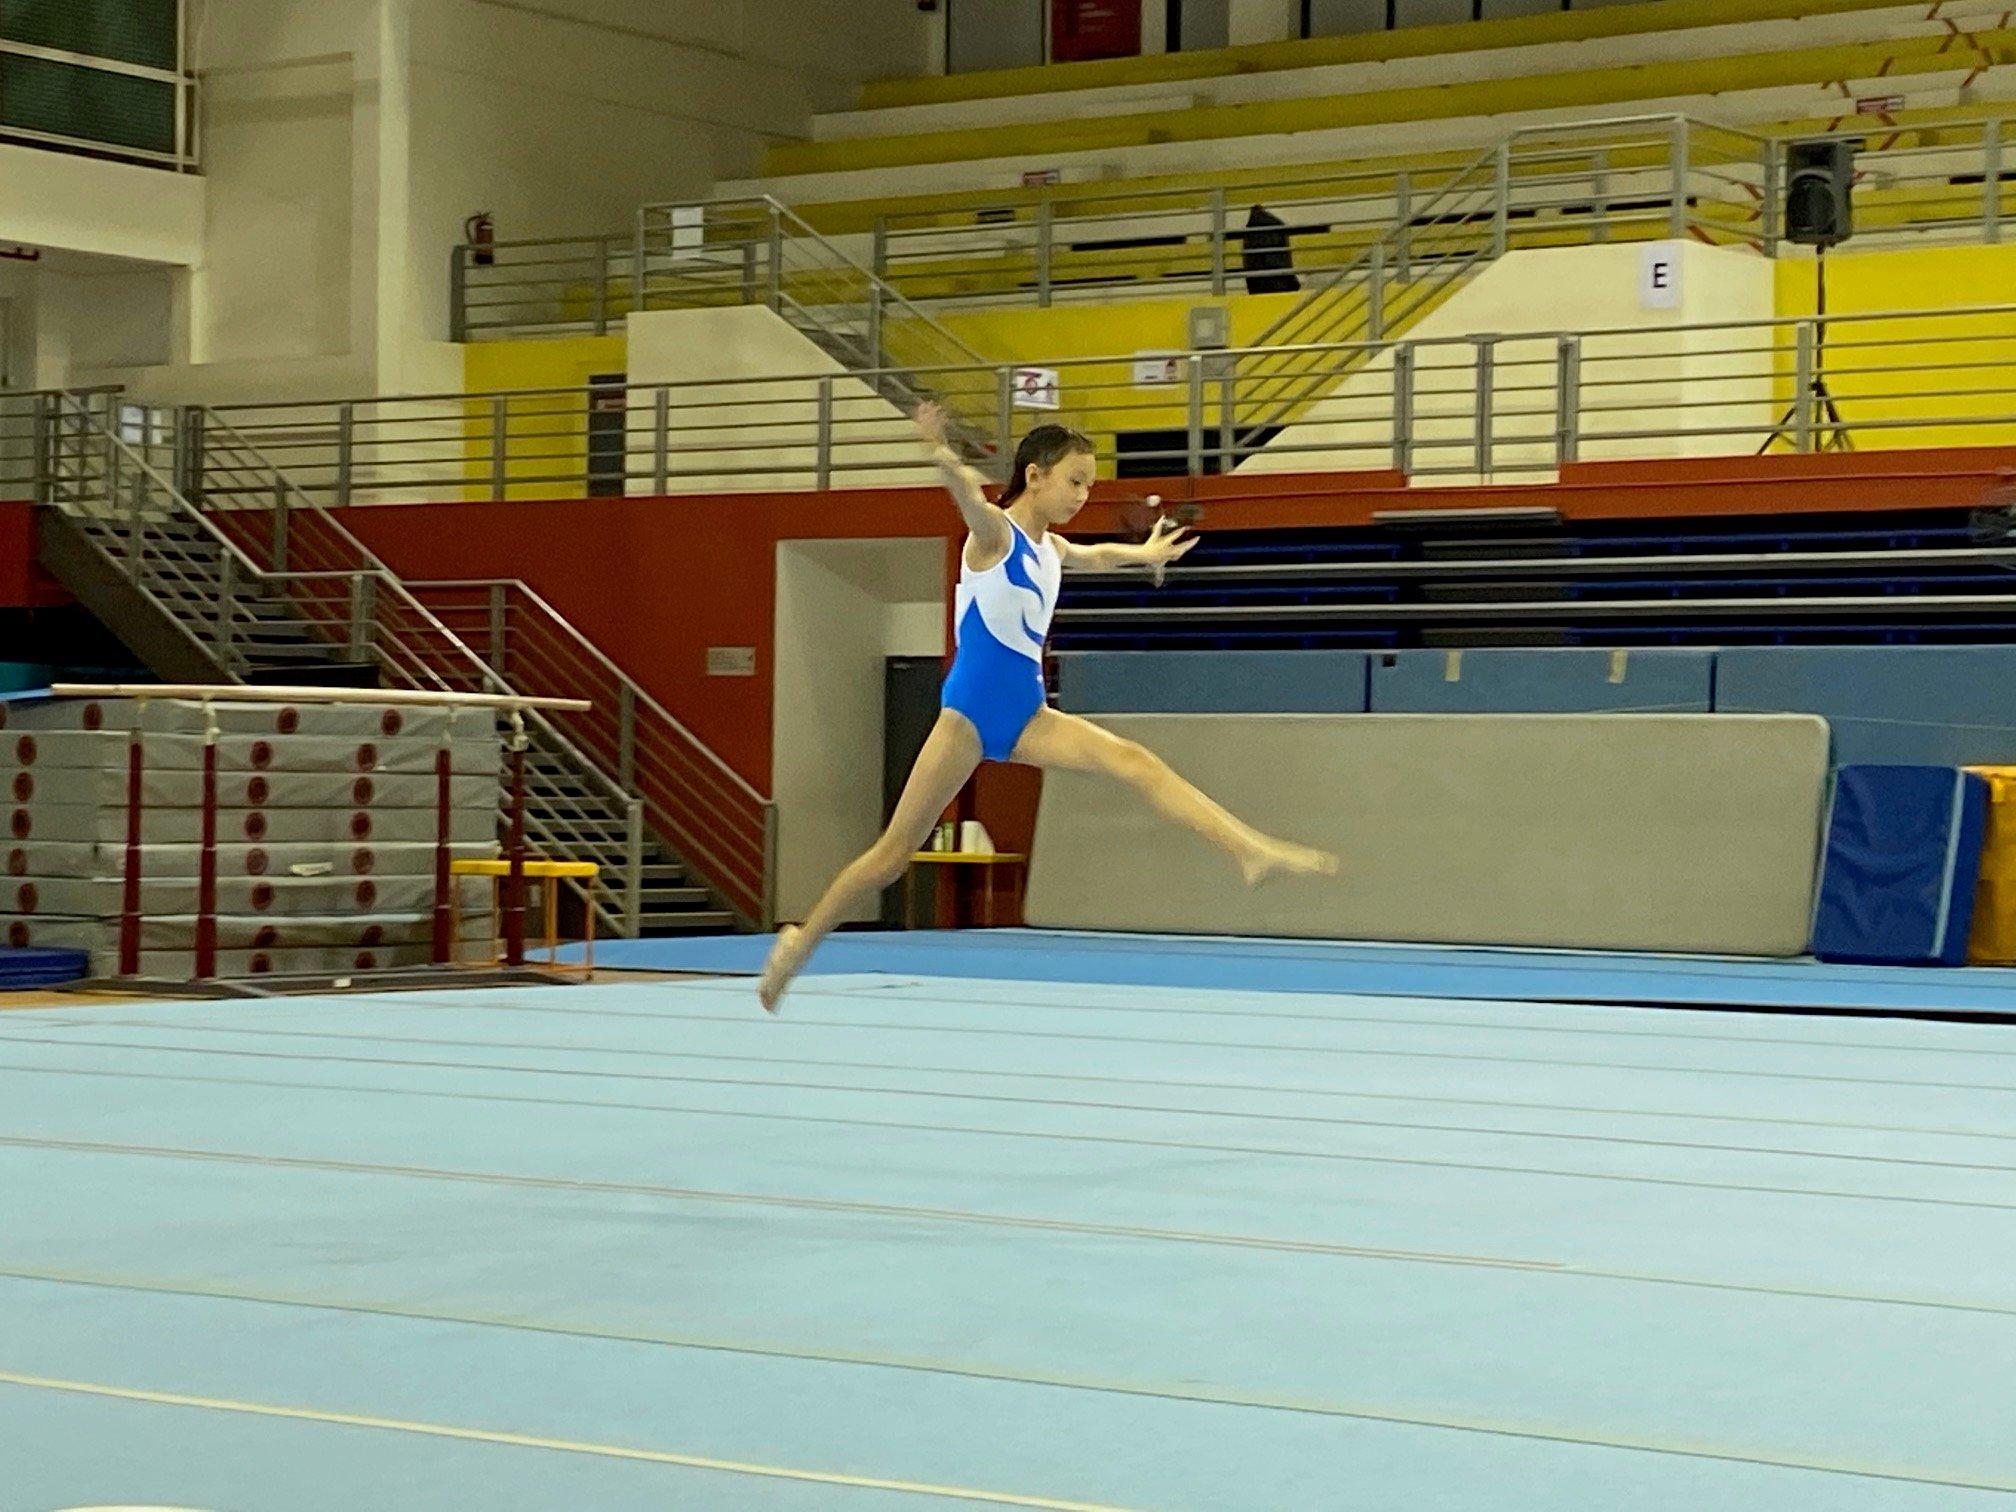 NSG Snr Div gymnastics - floor exercise (Henry Park) 4